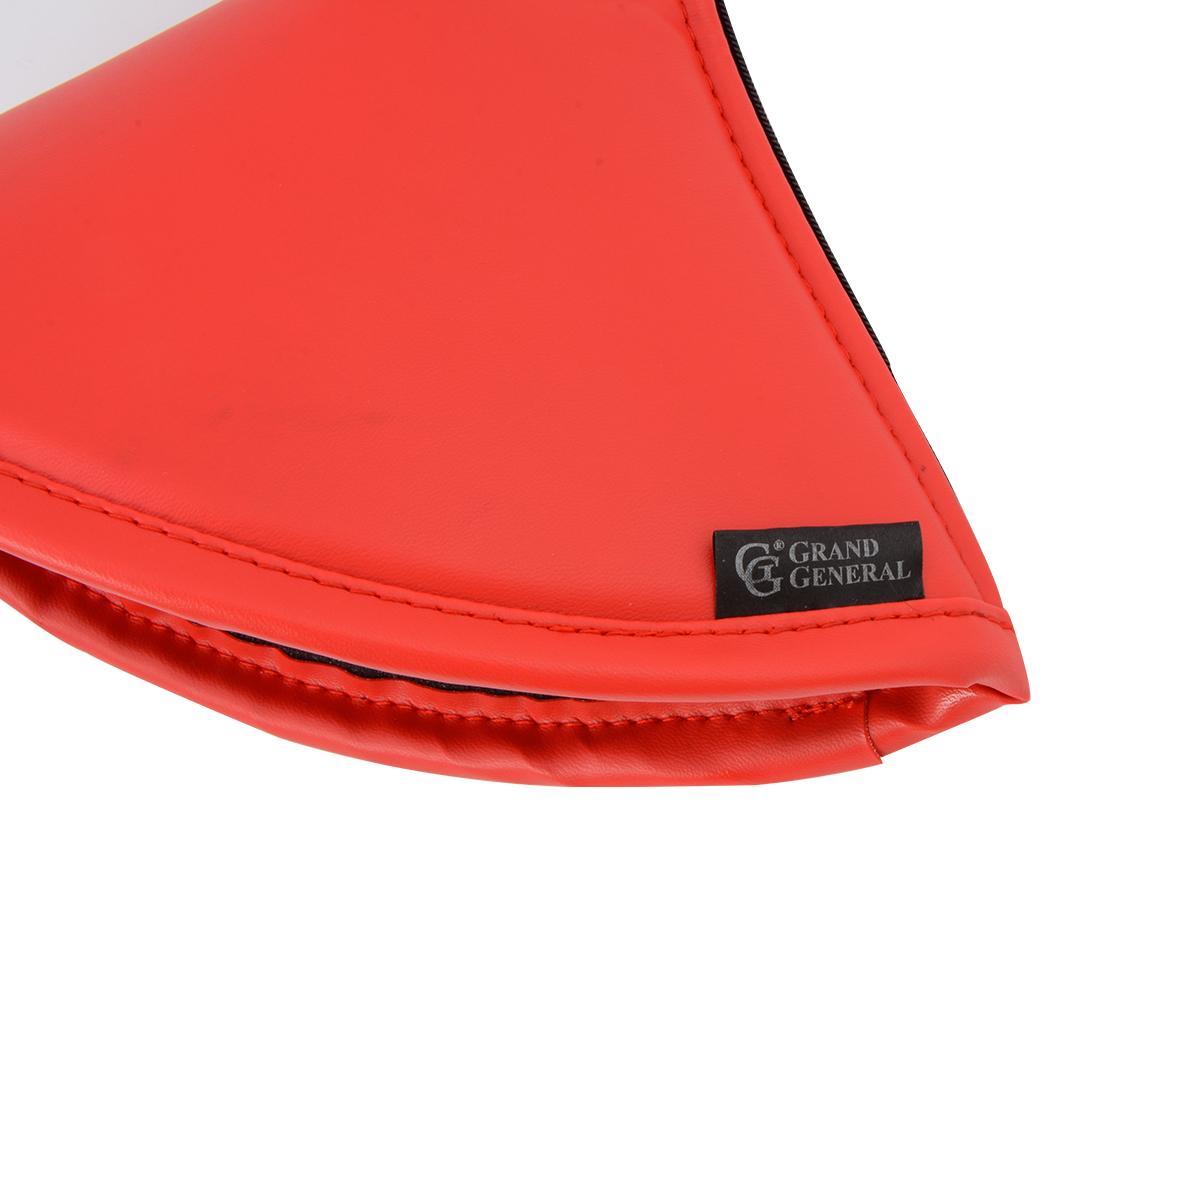 GG Grand General 99869 Matte Black Carbon Fiber Gear Shift Knob Cover w//Red Stitching